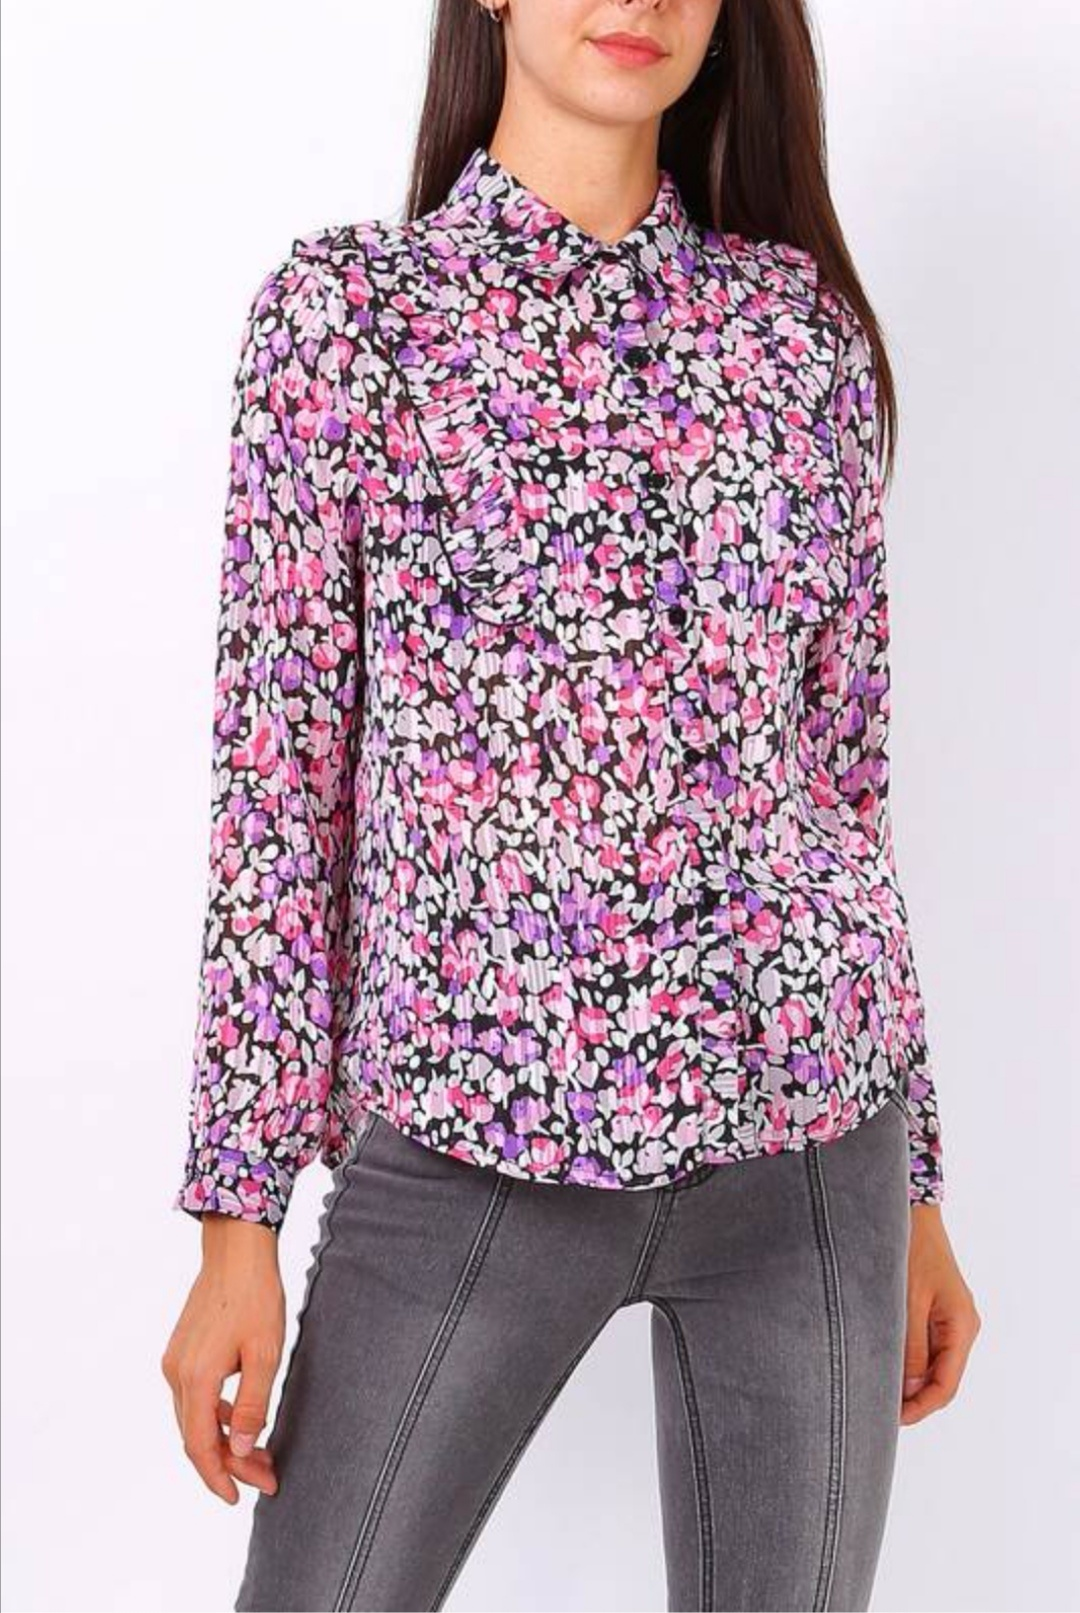 PEPITES blouse simone-1